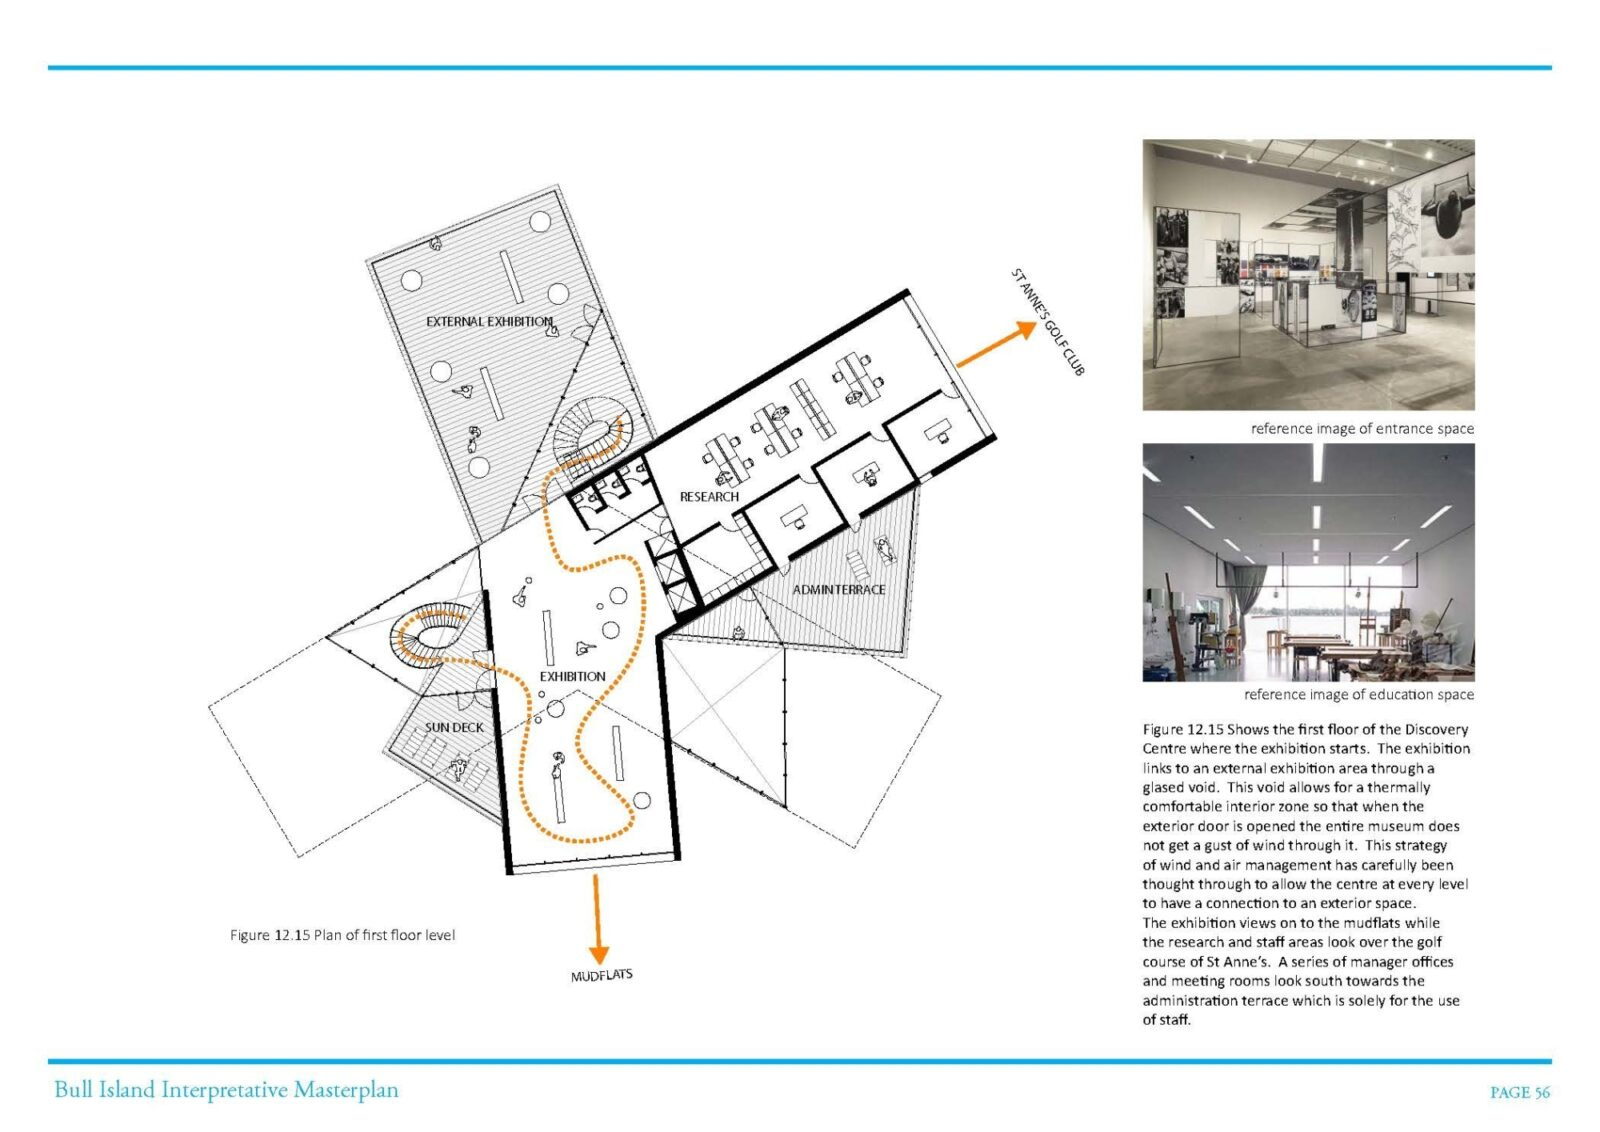 1326 Bull Island Final Report Website 5 Reduced 140815 22